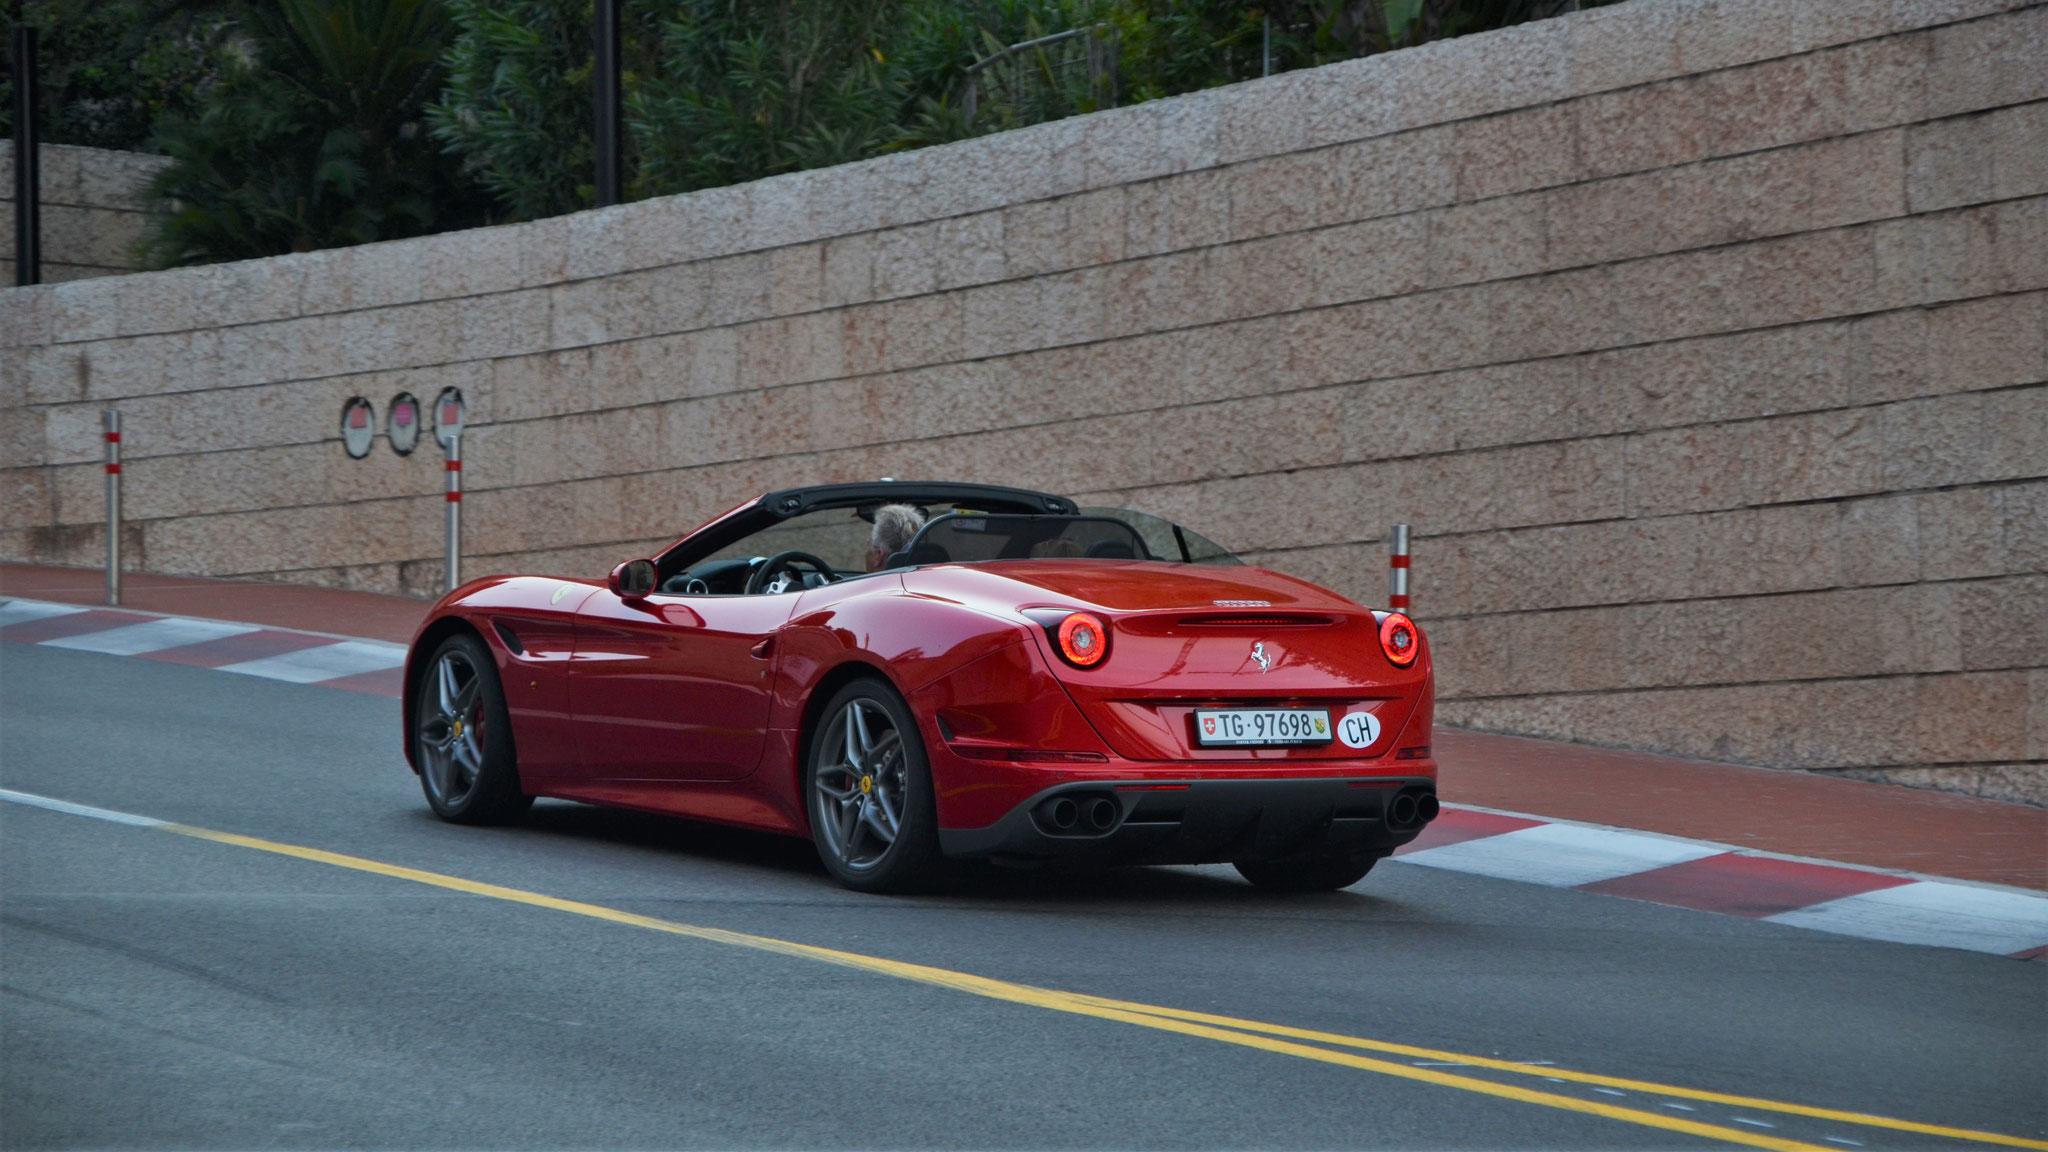 Ferrari California T - TG-97698 (CH)